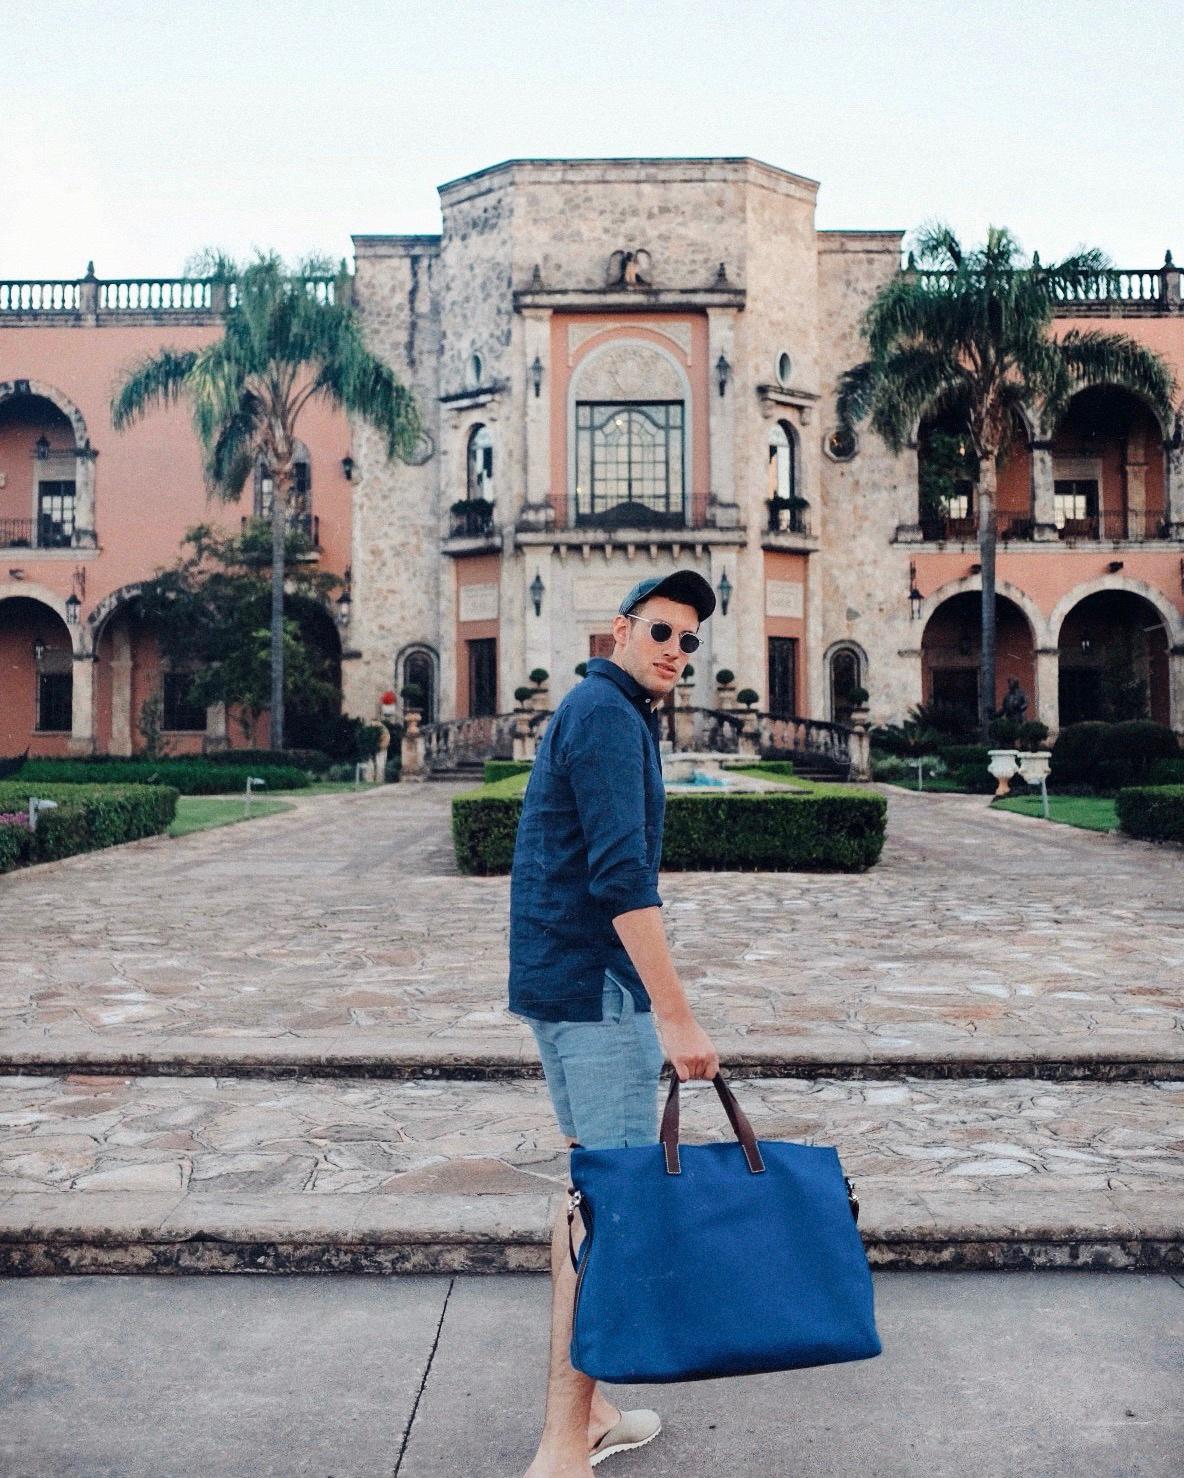 Checking into the Patron Hacienda